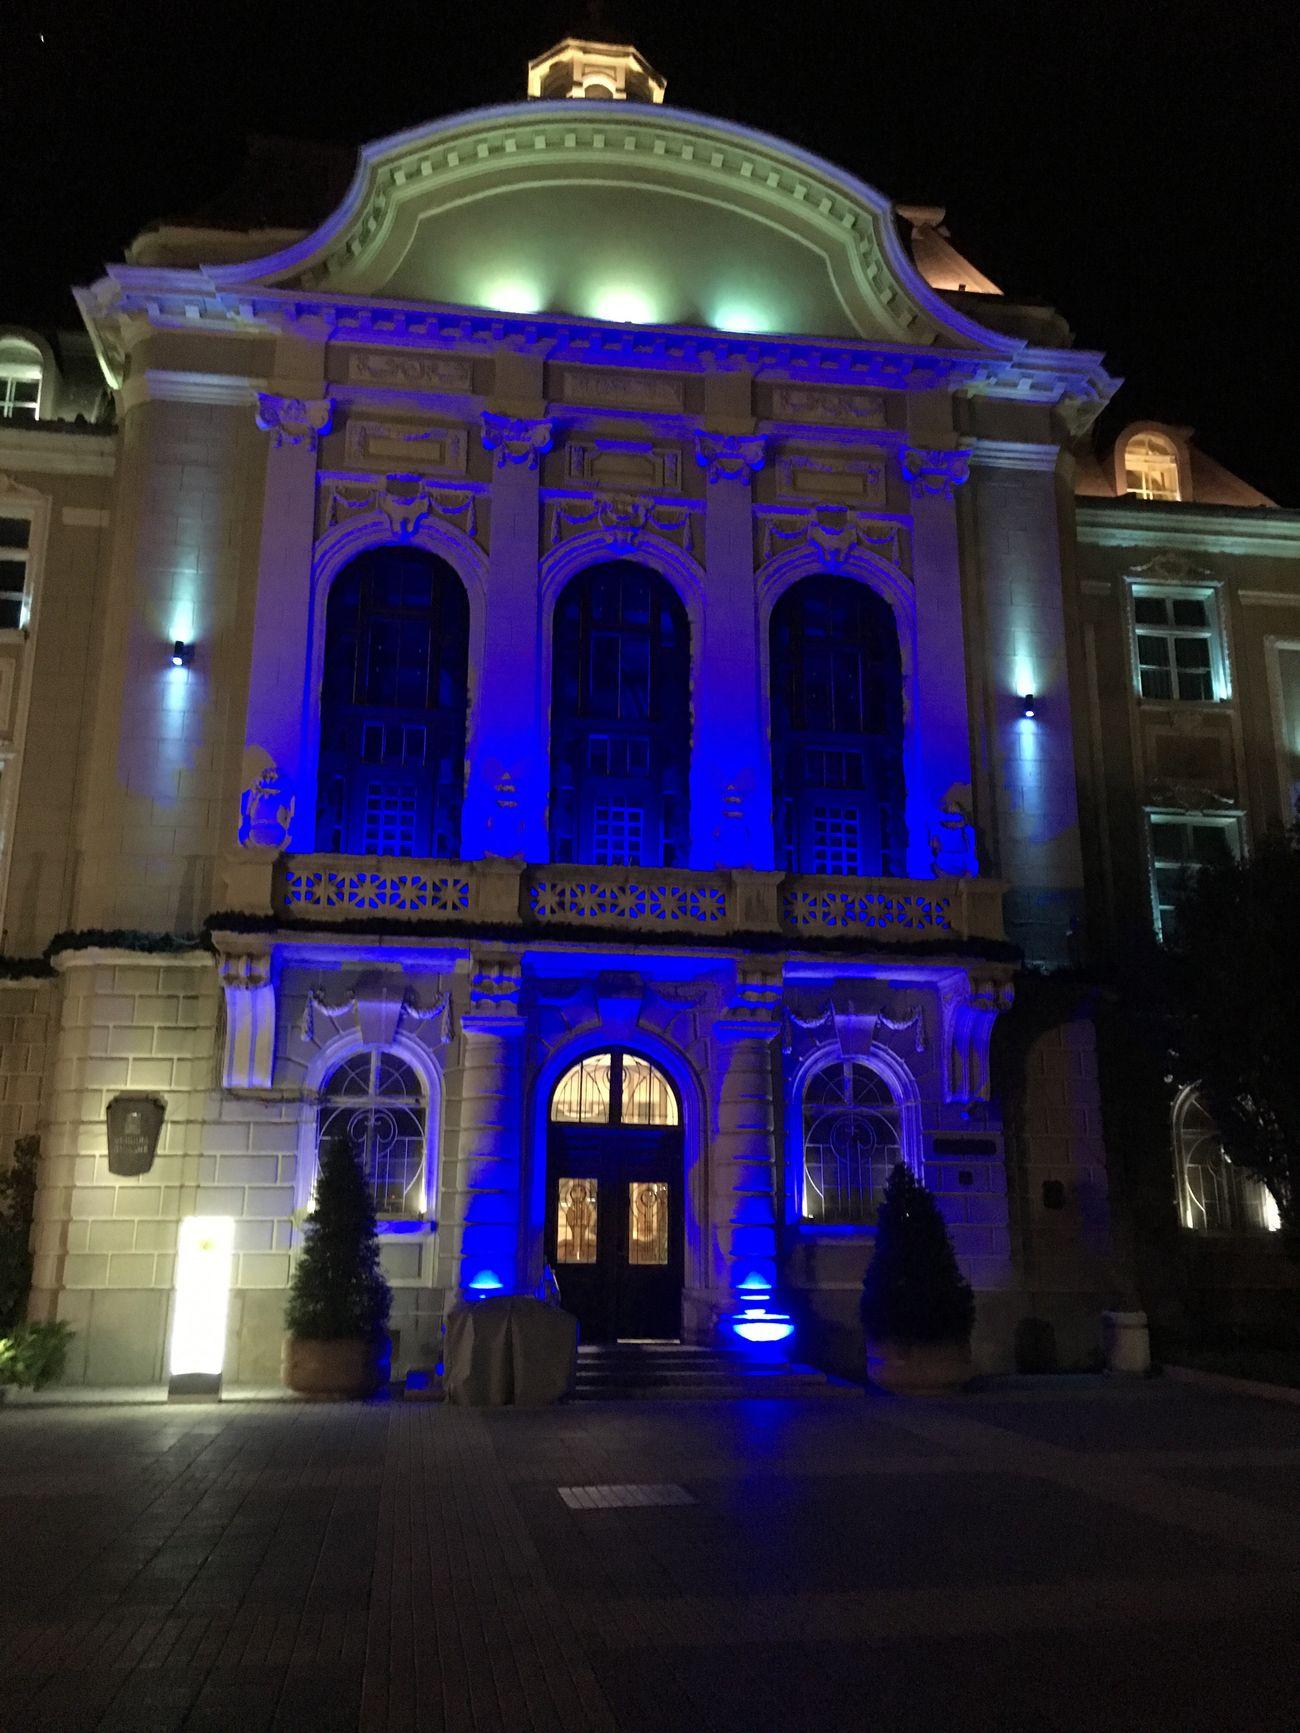 Illuminated Architecture Night City No People Architectural Column